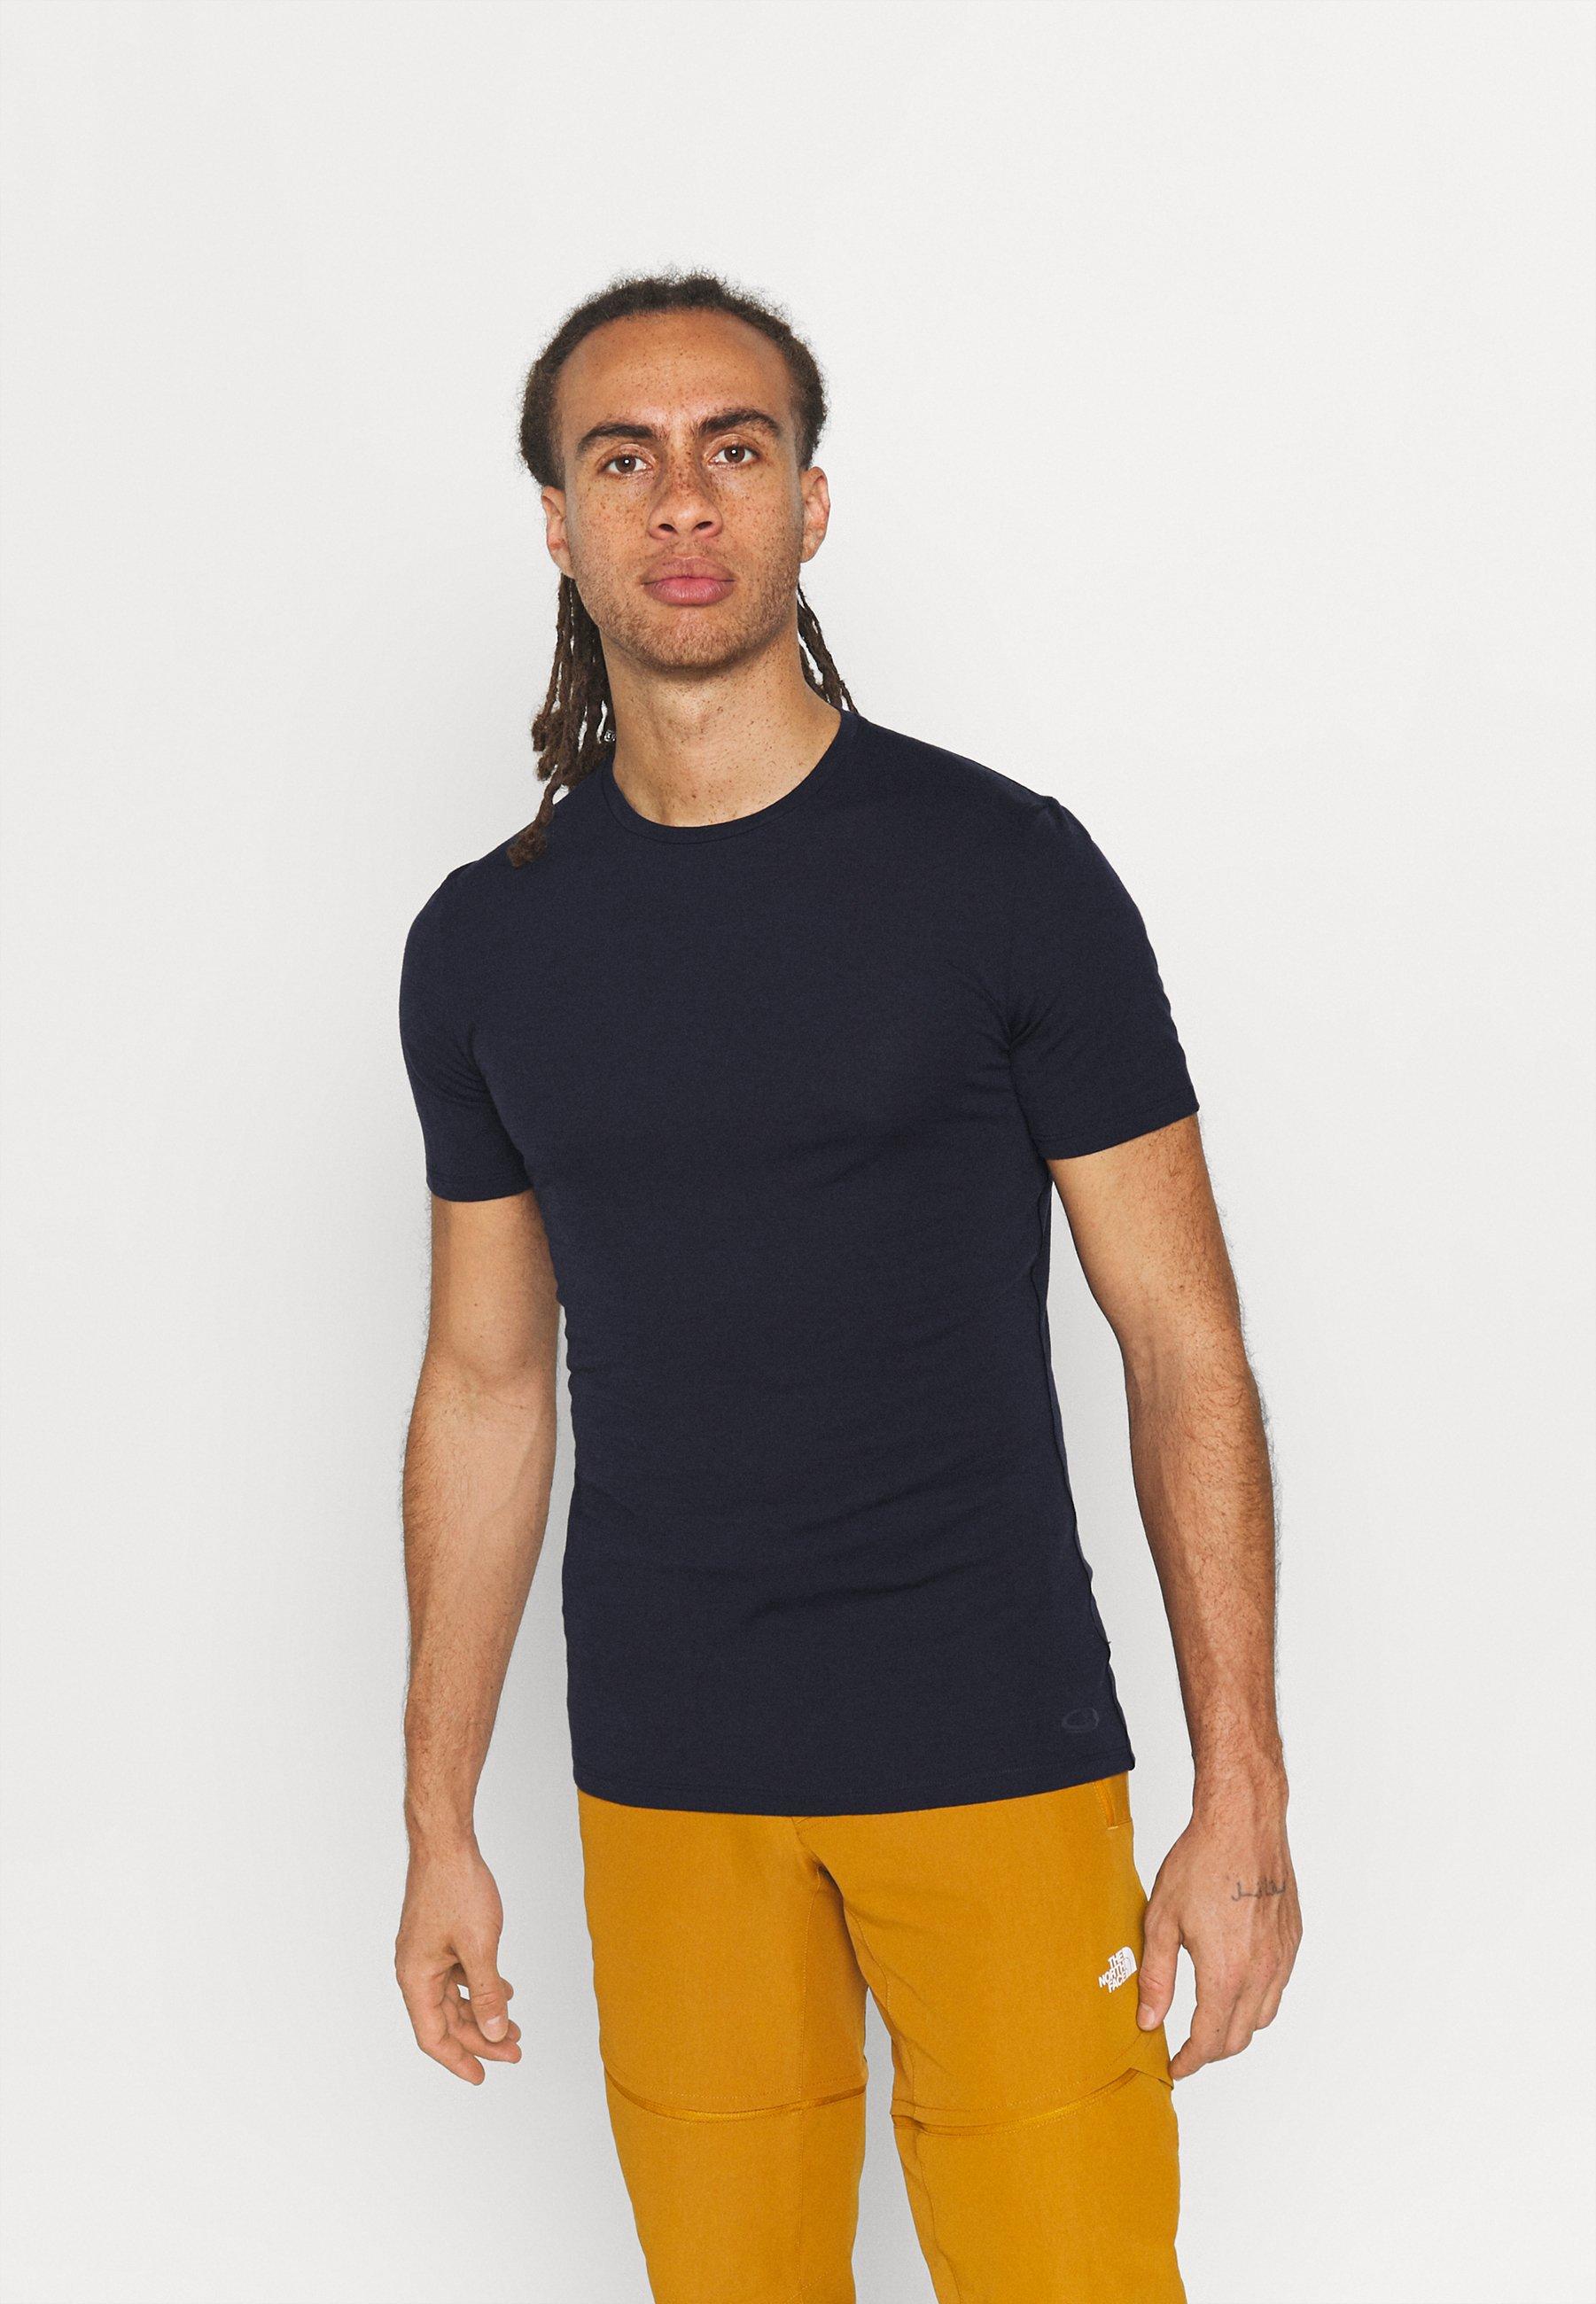 Men ANATOMICA CREWE - Undershirt